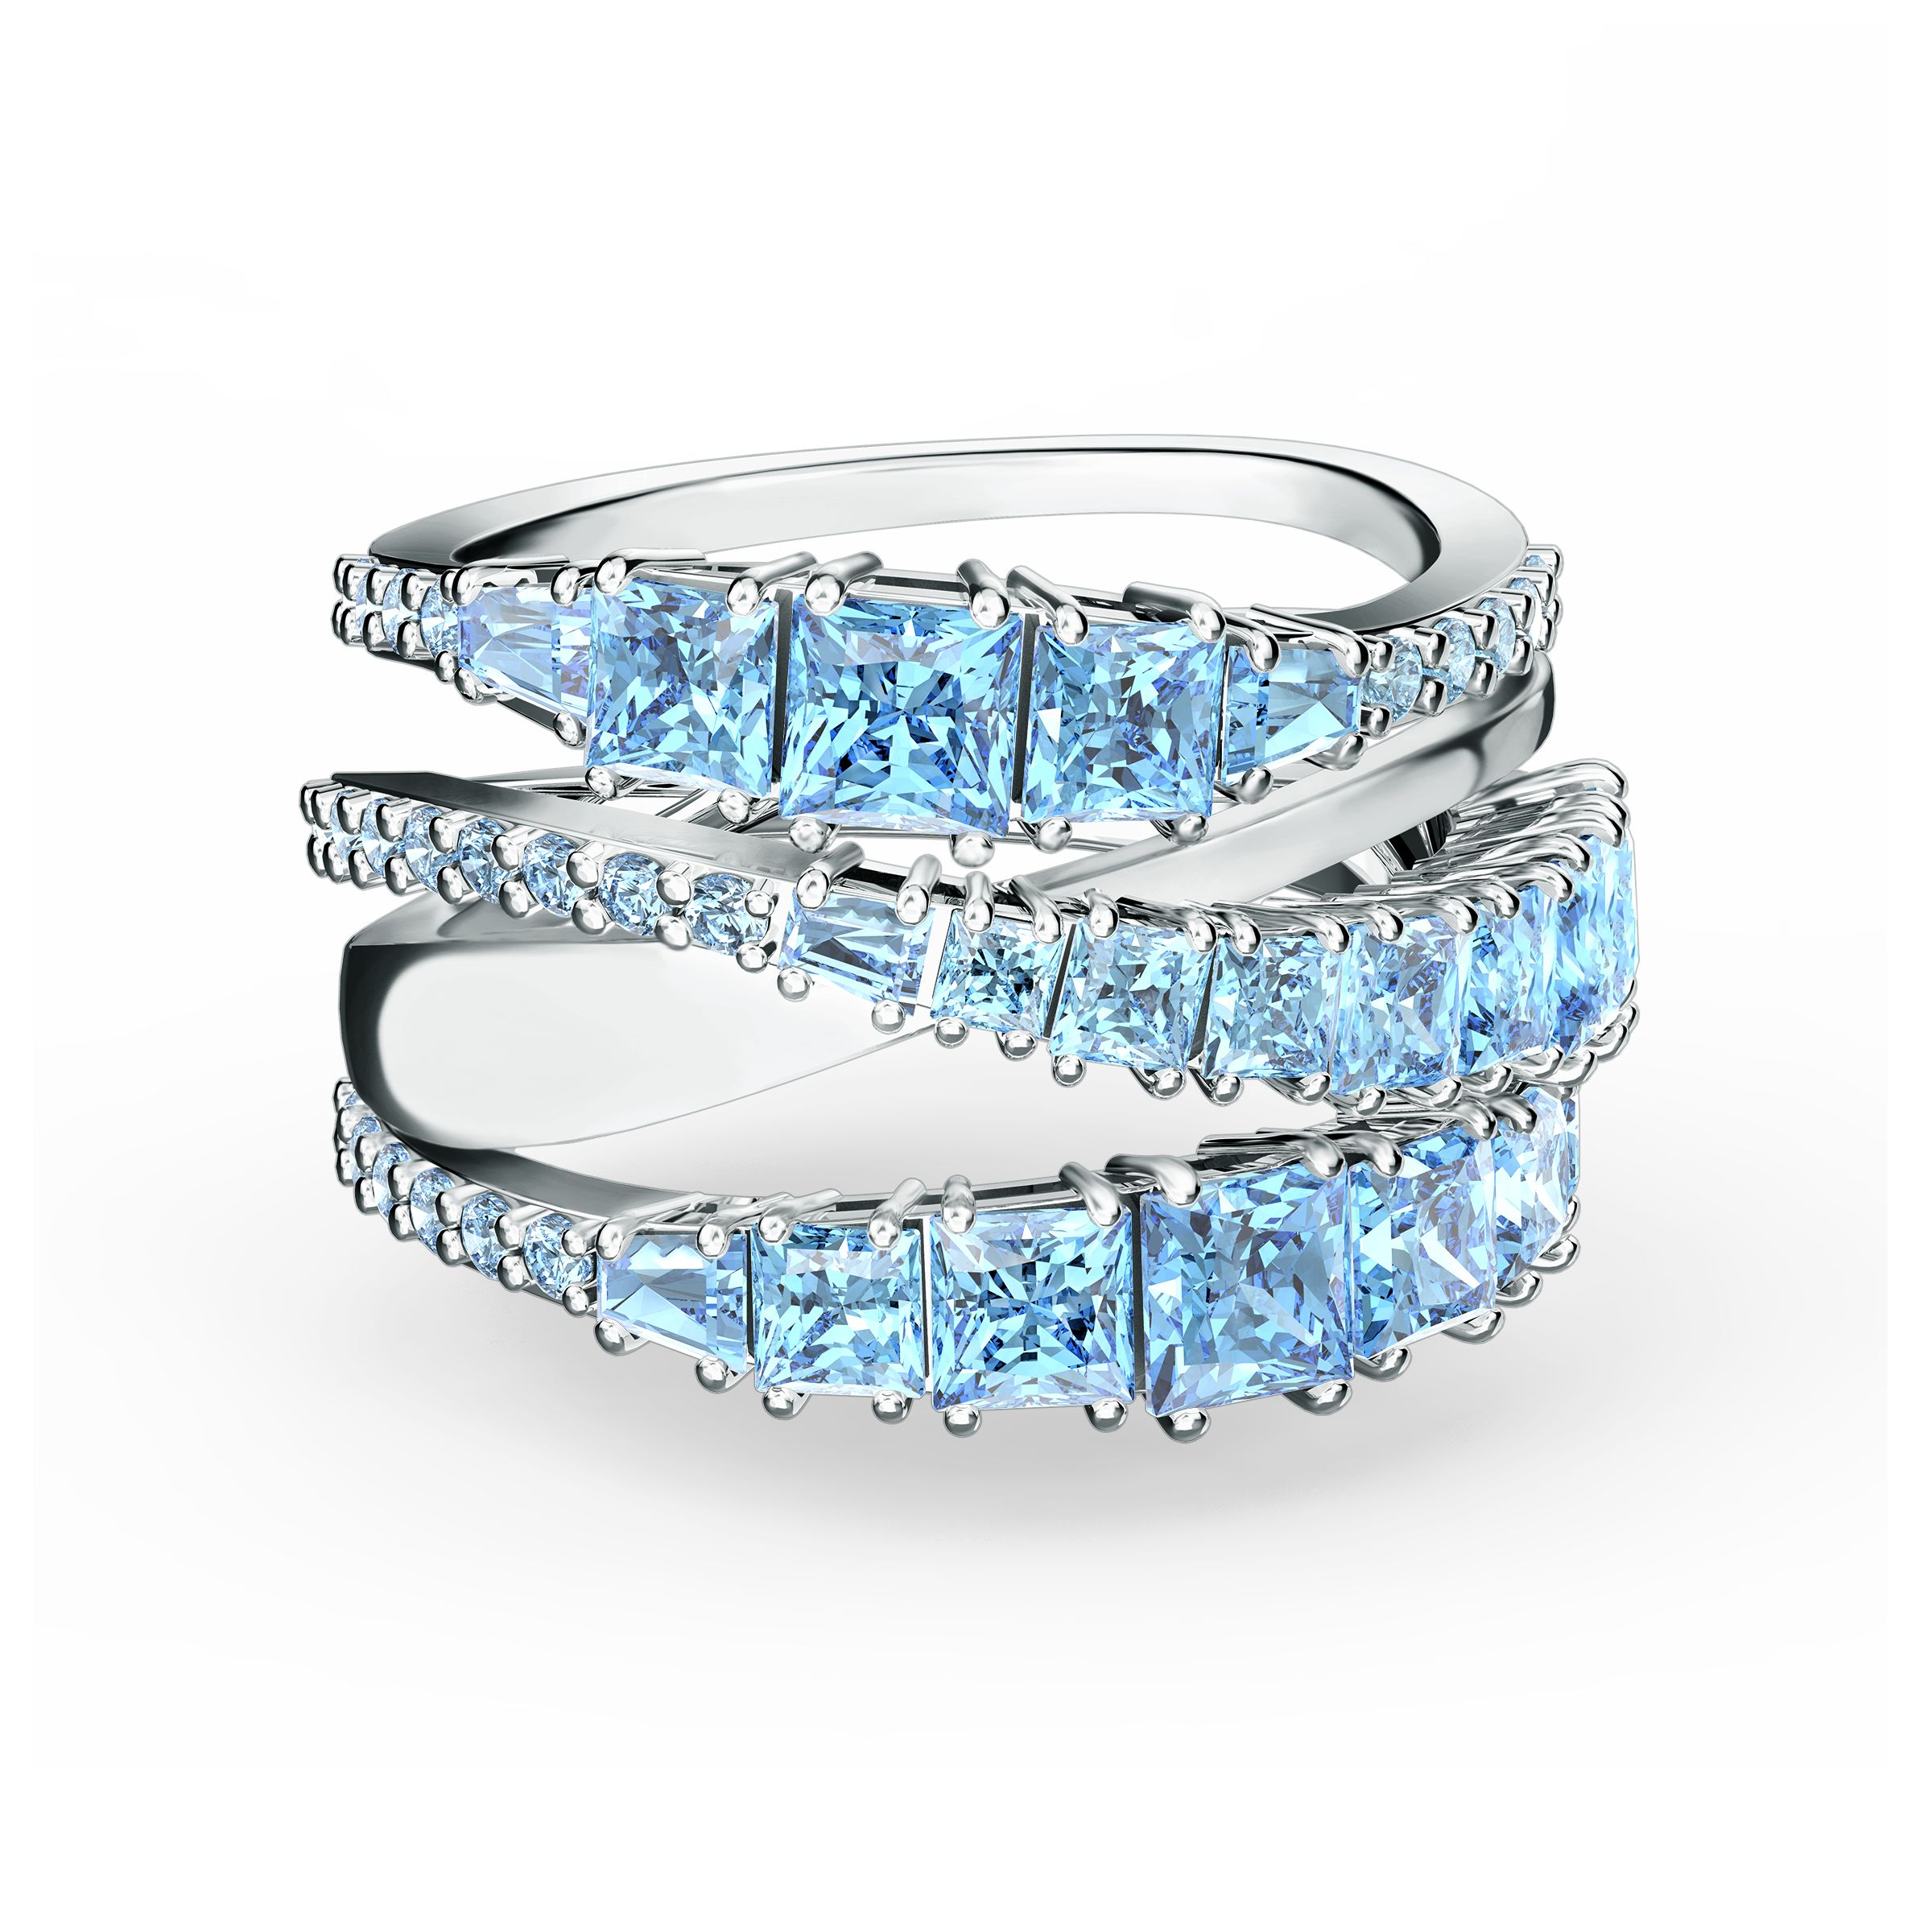 Bague Twist Wrap, bleu, métal rhodié, Swarovski